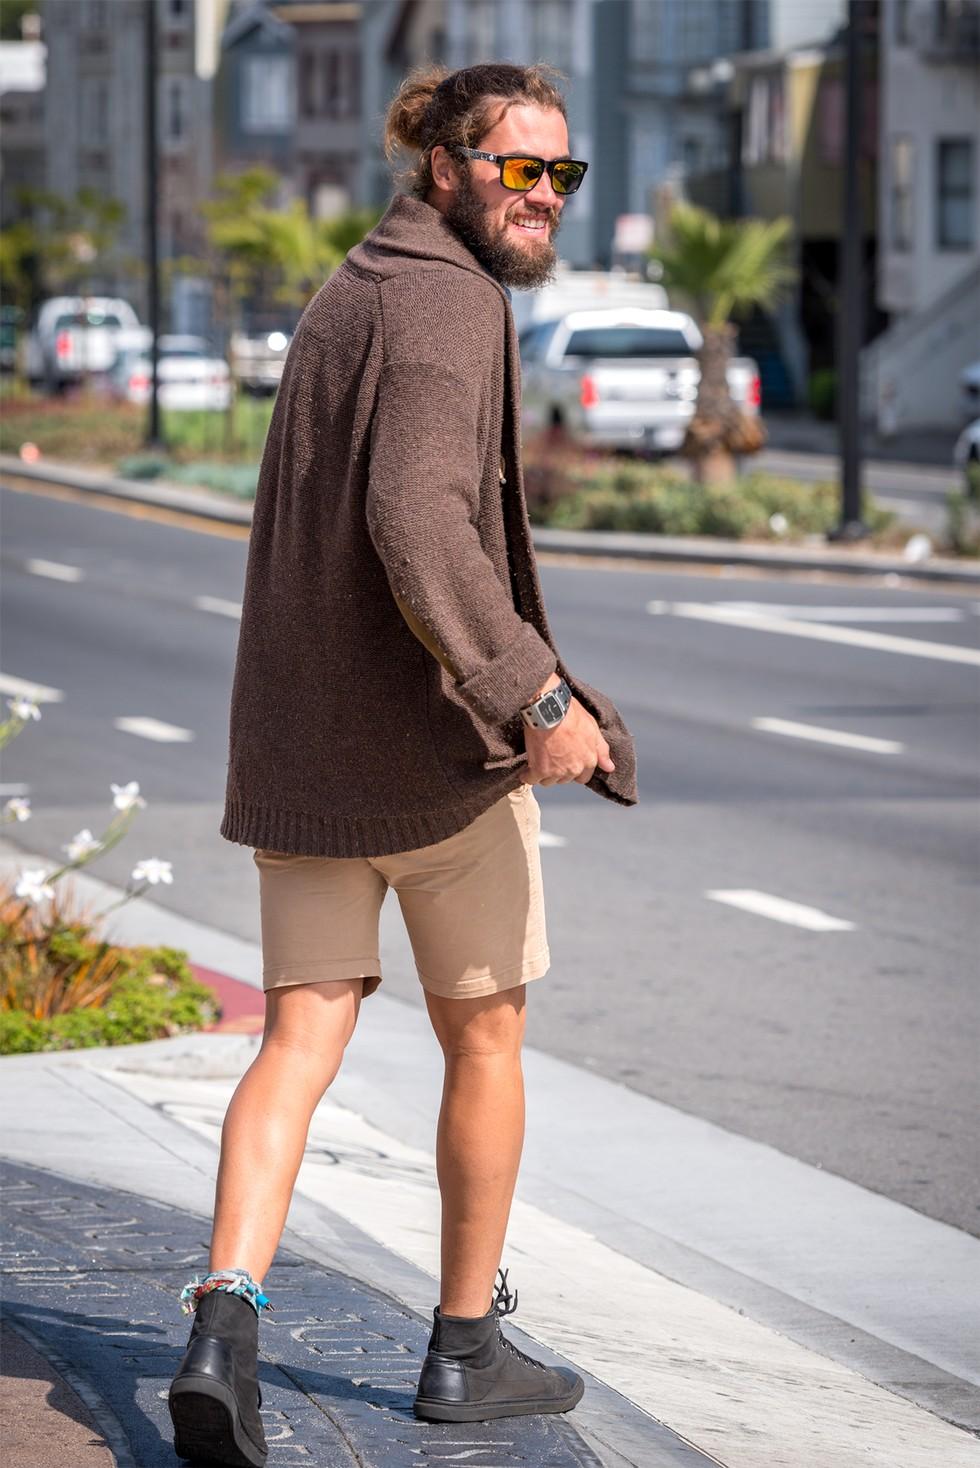 San francisco street fashion 82